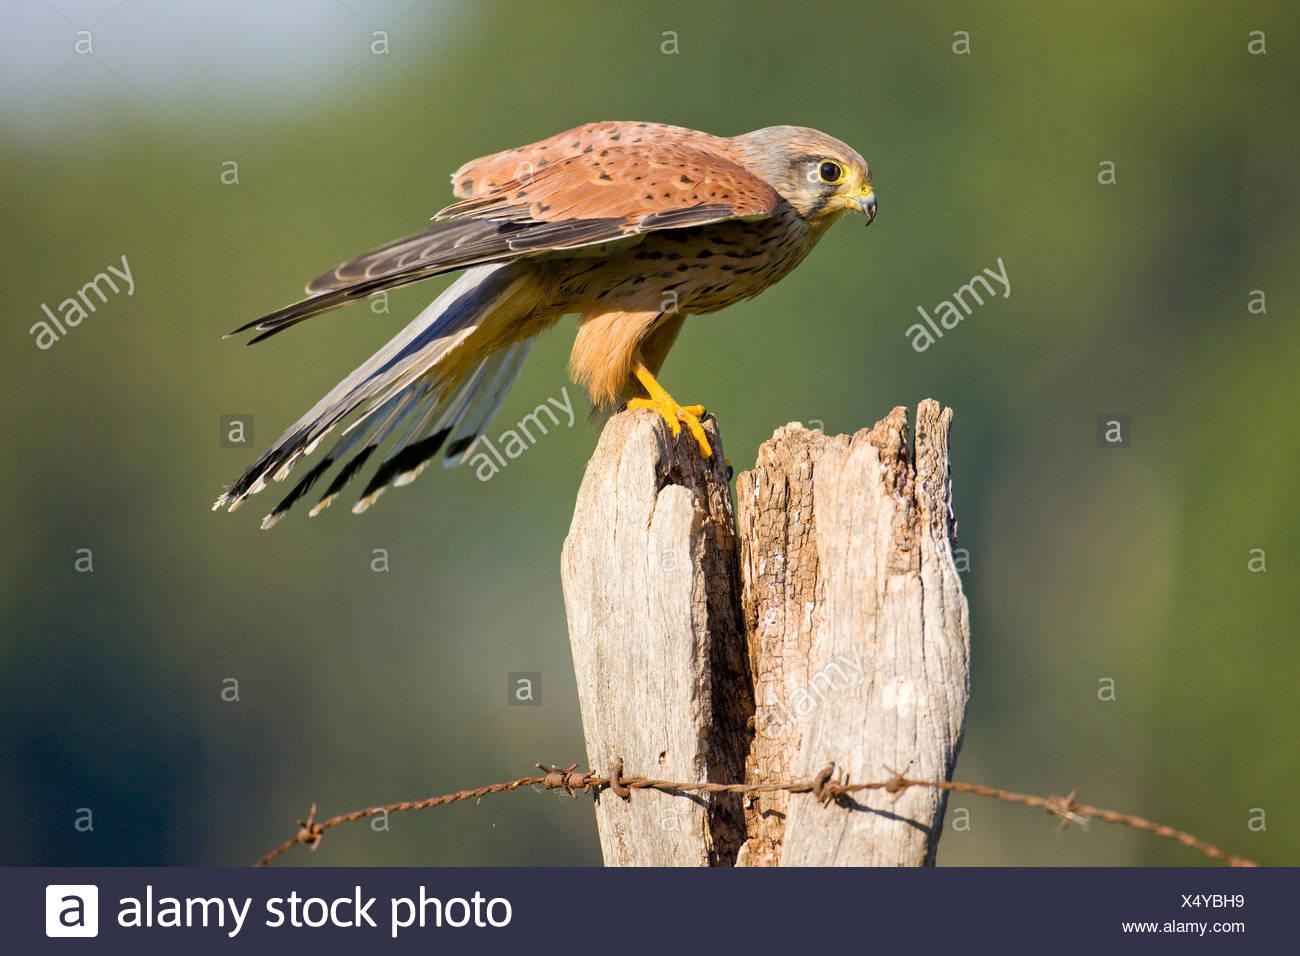 Kestrel (Falco tinnunculus), young male on a fence post, Vulkan Eifel, Rhineland-Palatinate, Germany, Europe - Stock Image